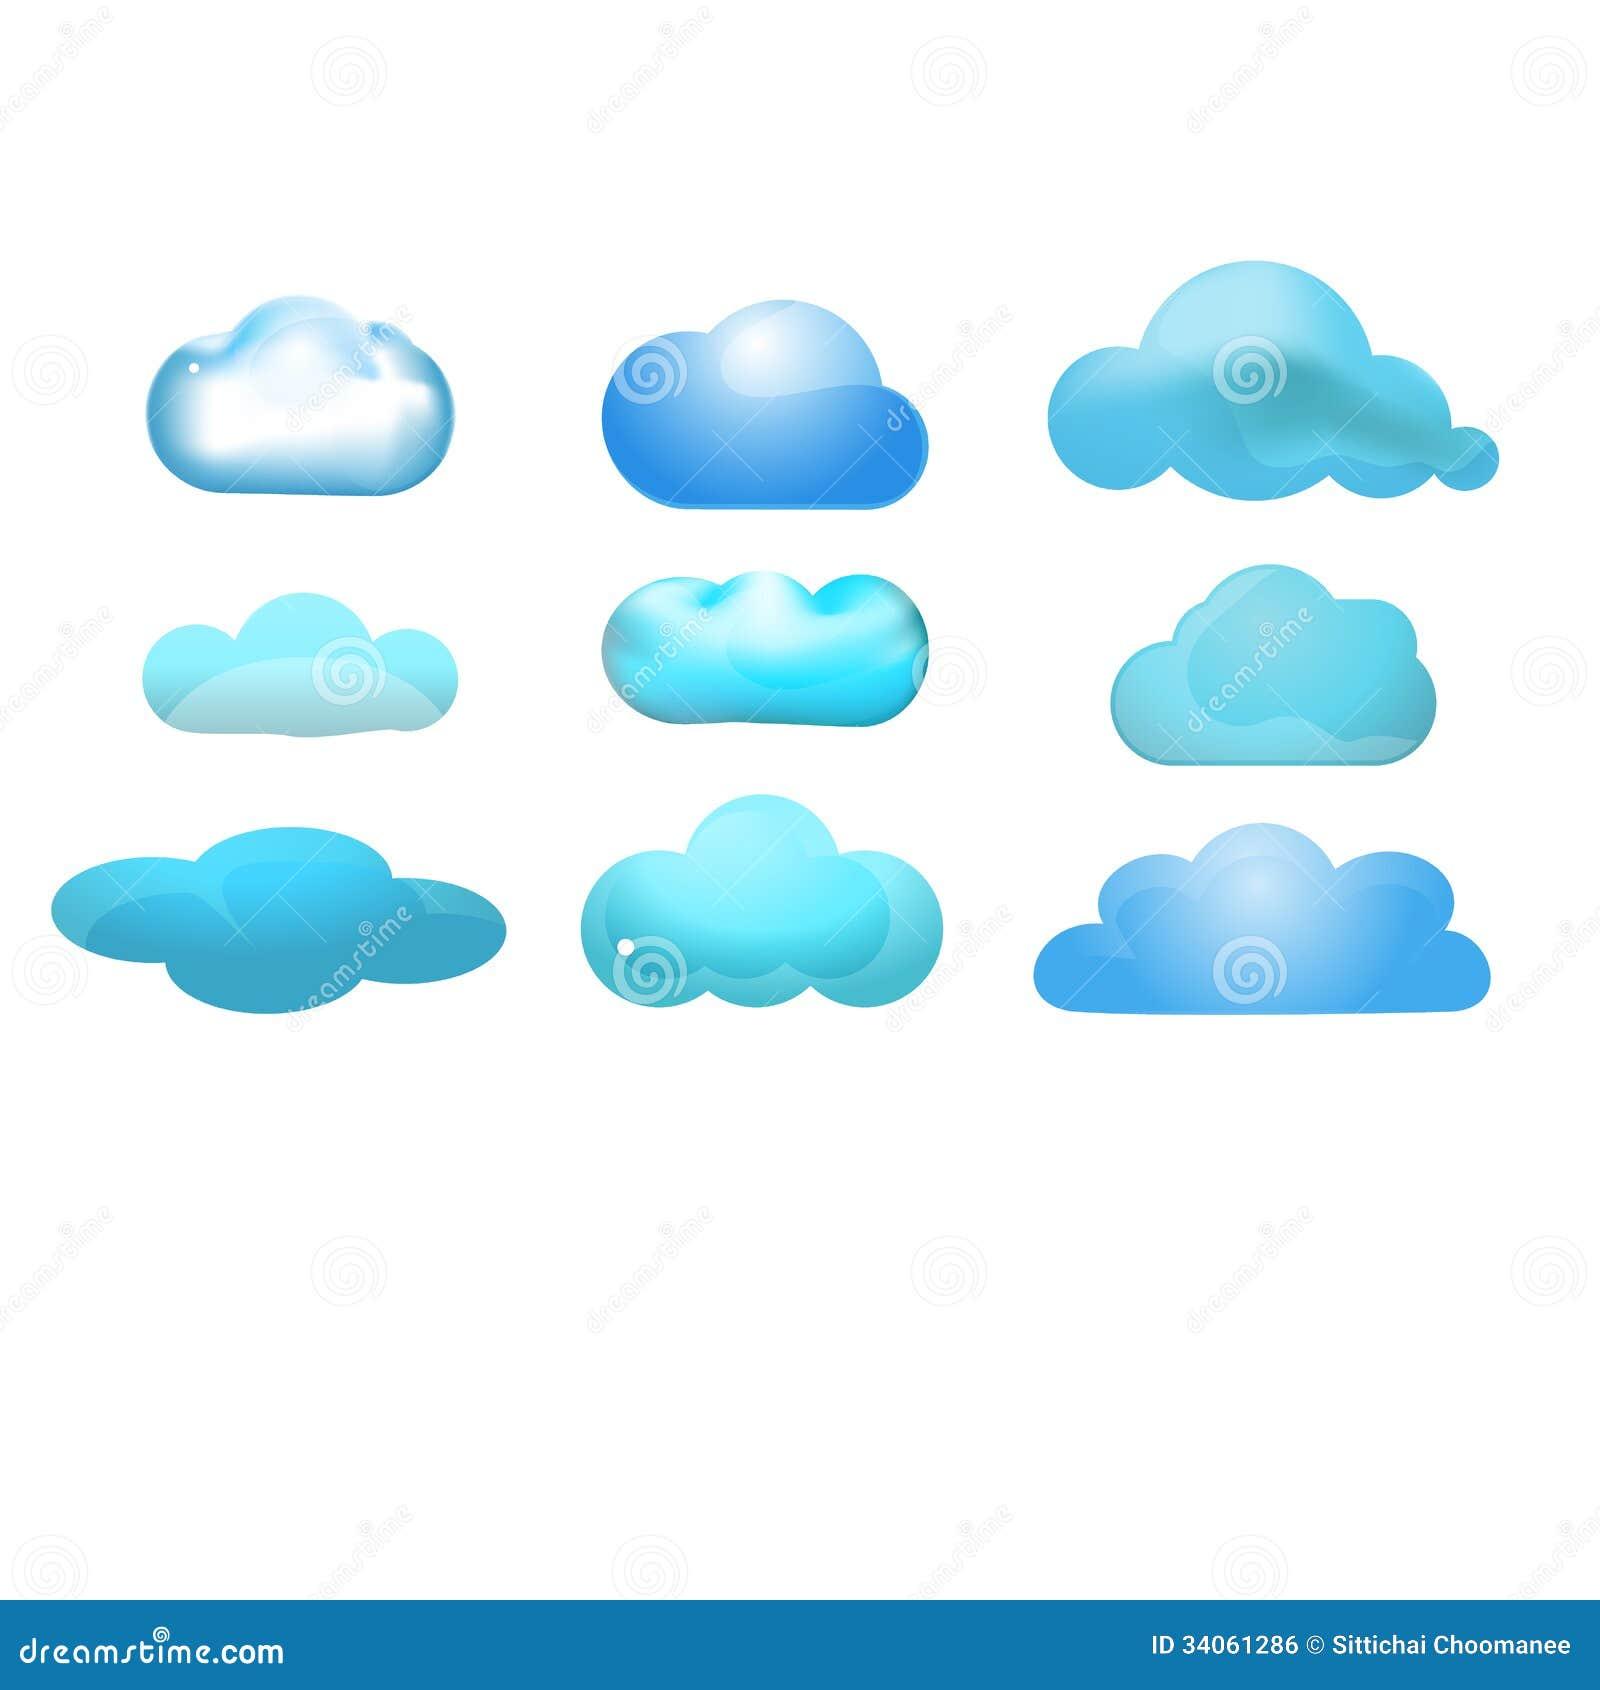 how to create cloud computing